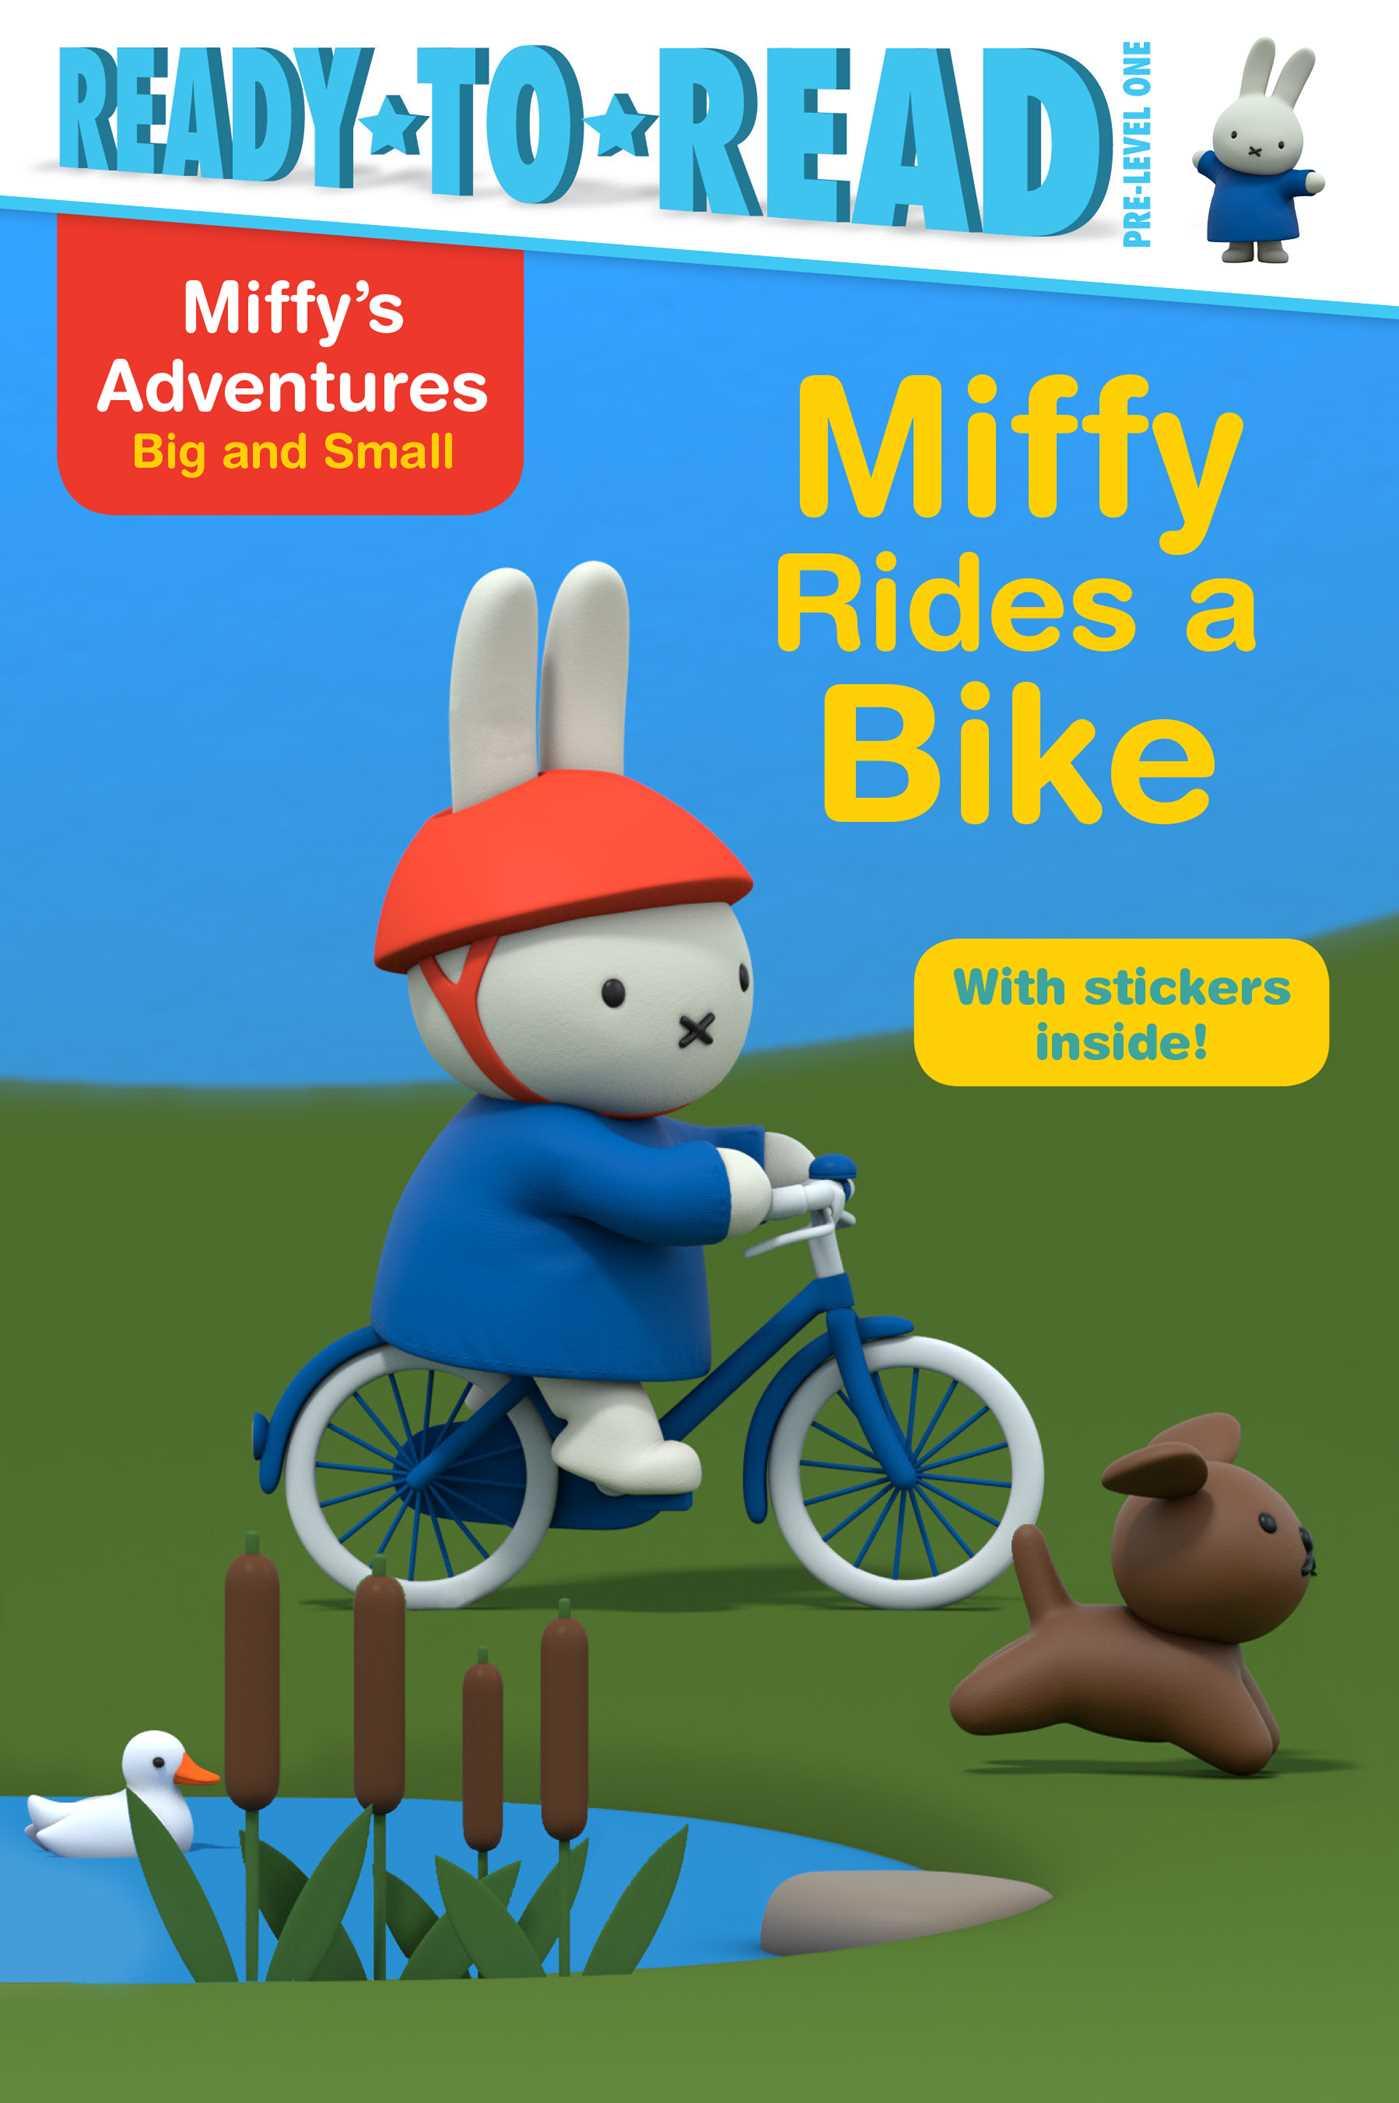 Miffy rides a bike 9781481495622 hr